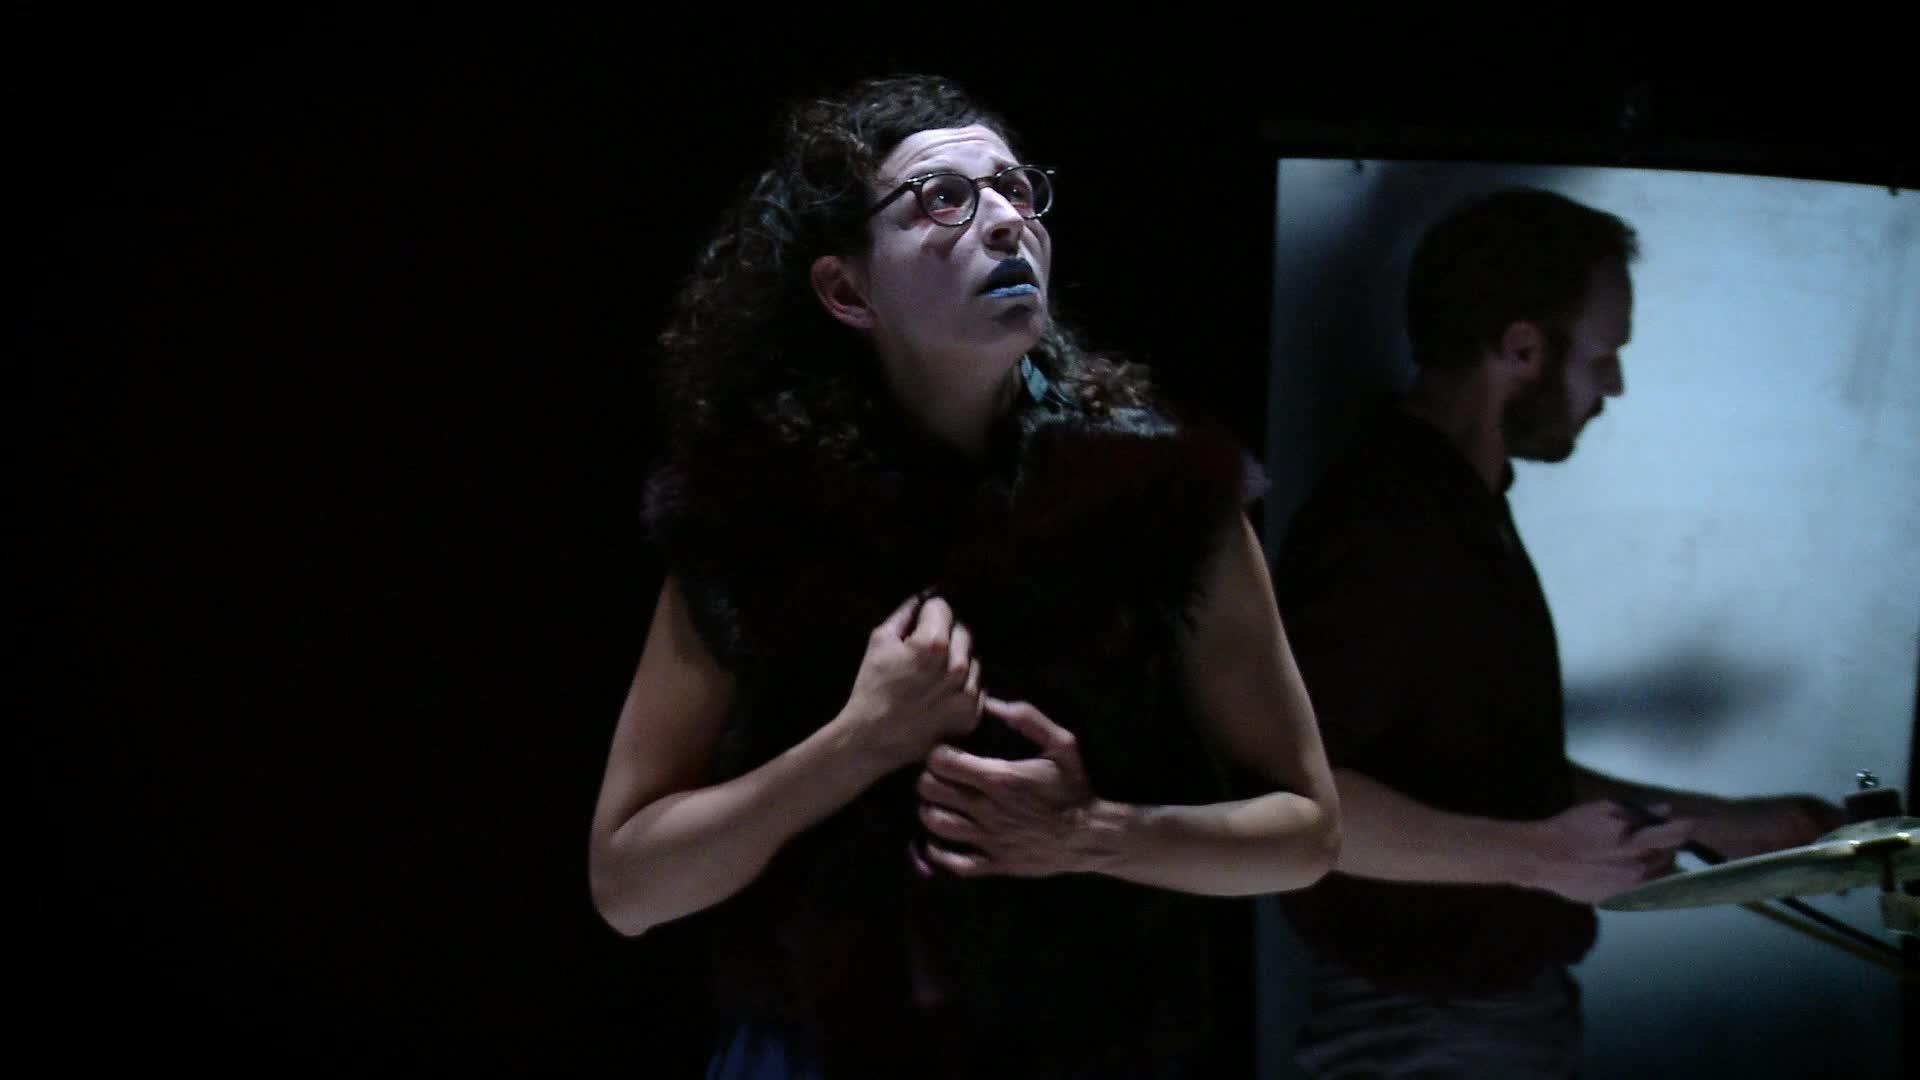 "Vidéo ""L'Empreinte du vertige"" - Clément Goethals/Angèle Baux Godard - Teaser"